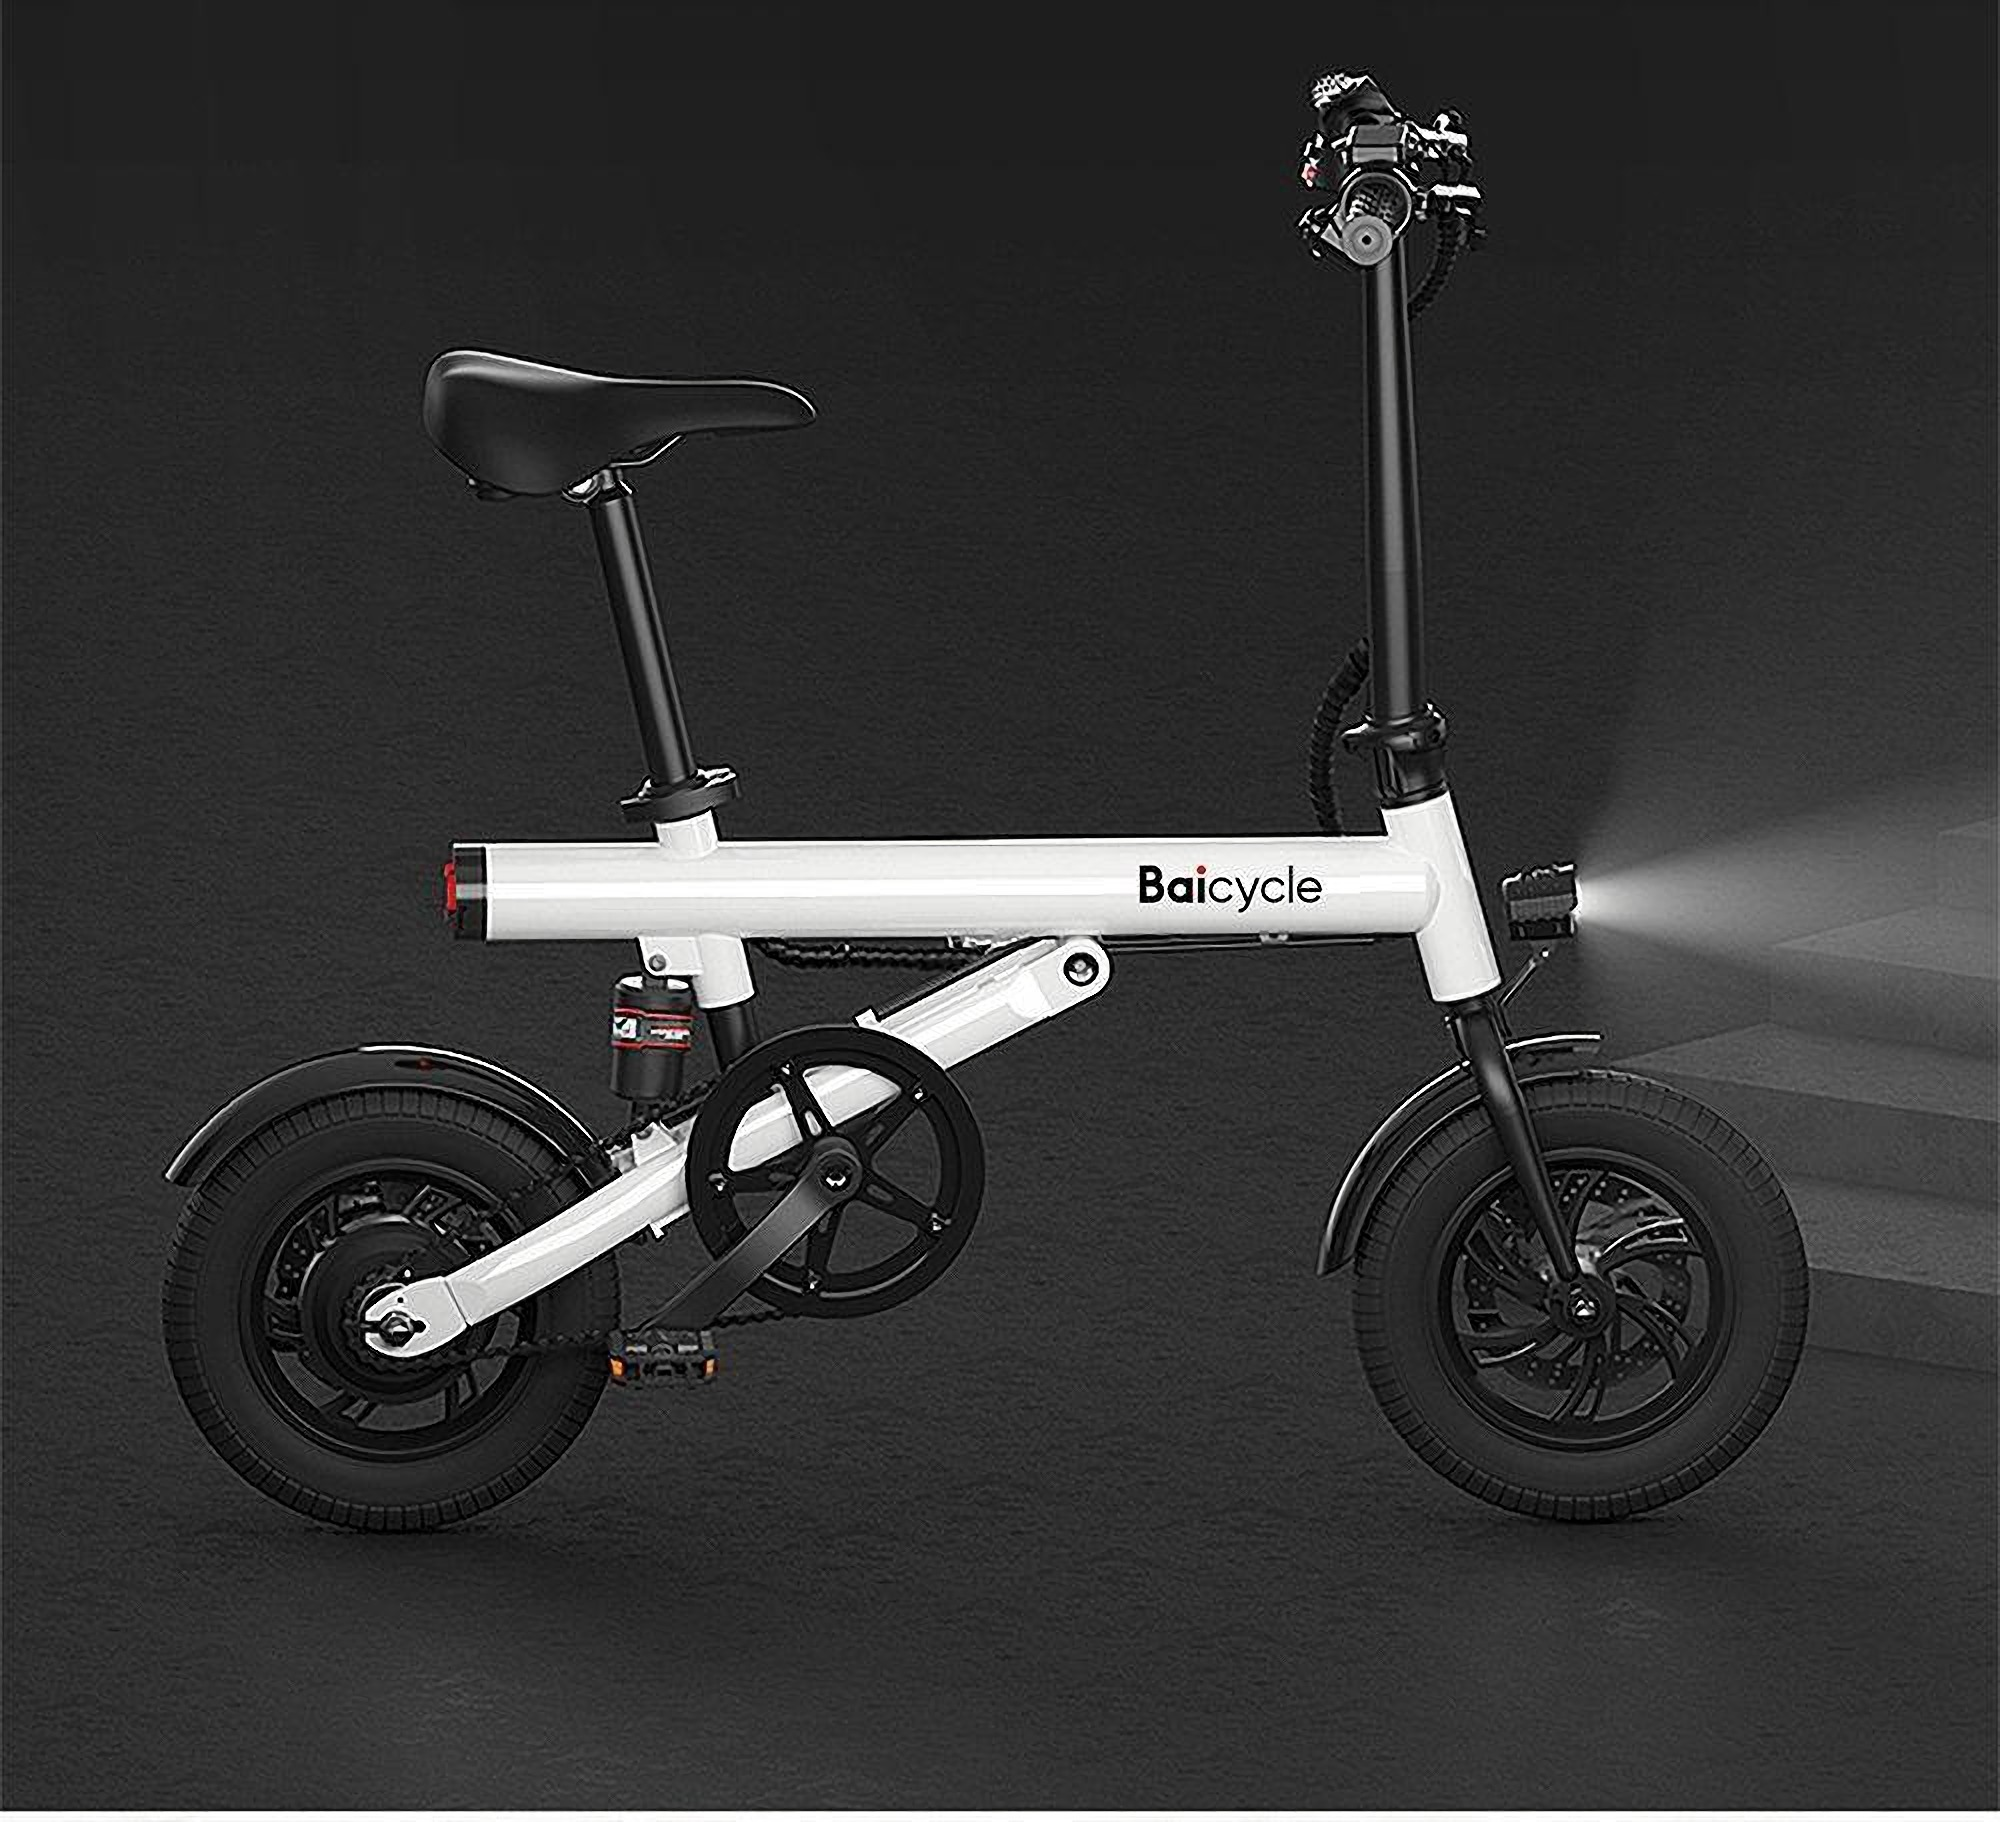 Skladné elektrokolo Baicycle Smart 2.0 nyní ve skvělé akci na Geekbuying.com [sponzorovaný článek]